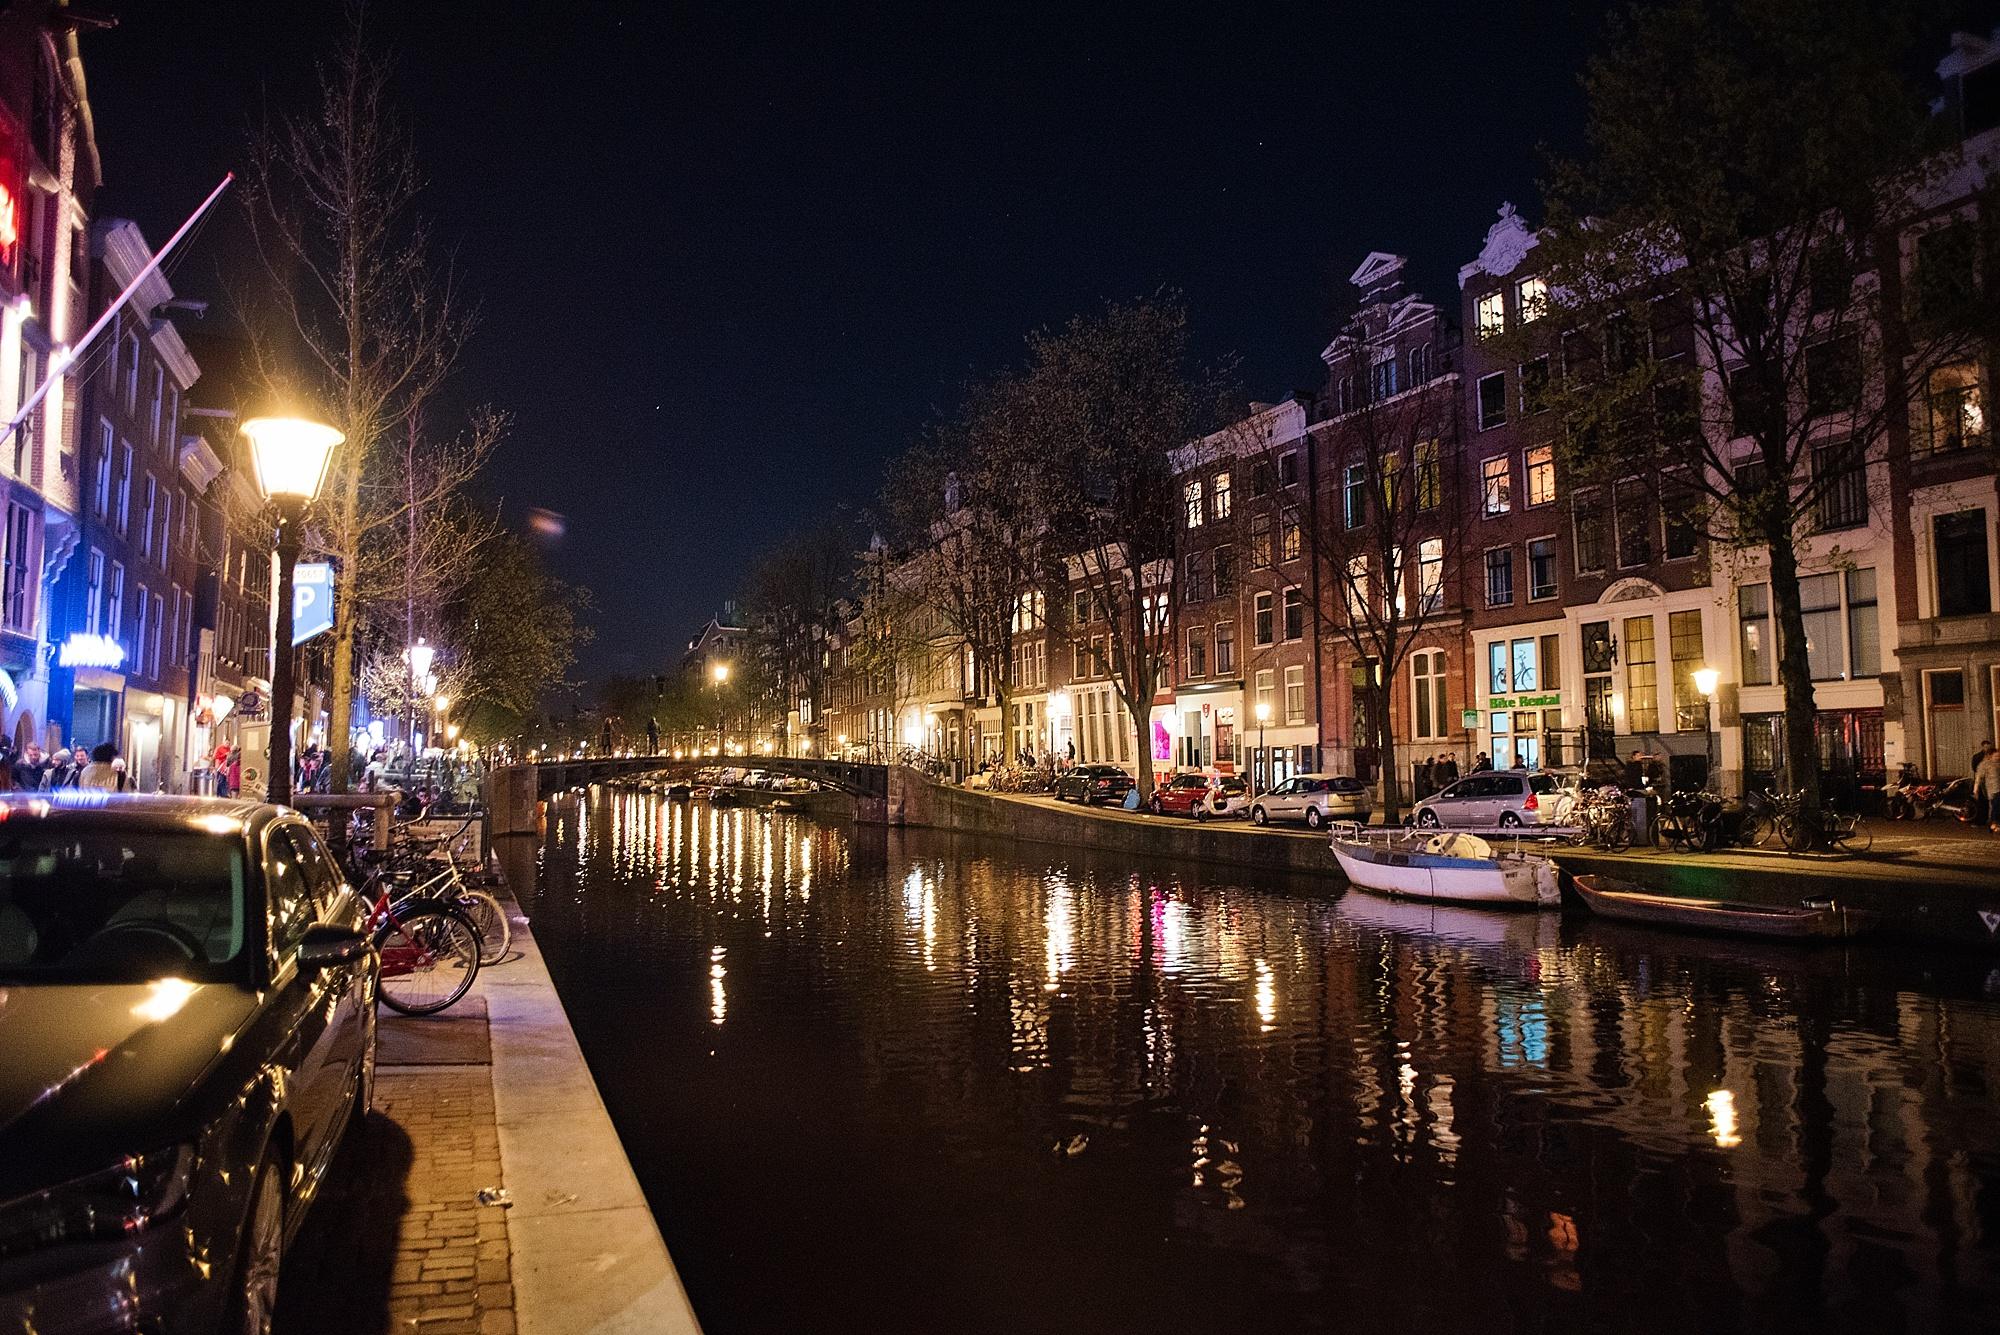 Darren-Bester-Photographer-Travel-Europe-Amsterdam_0046.jpg